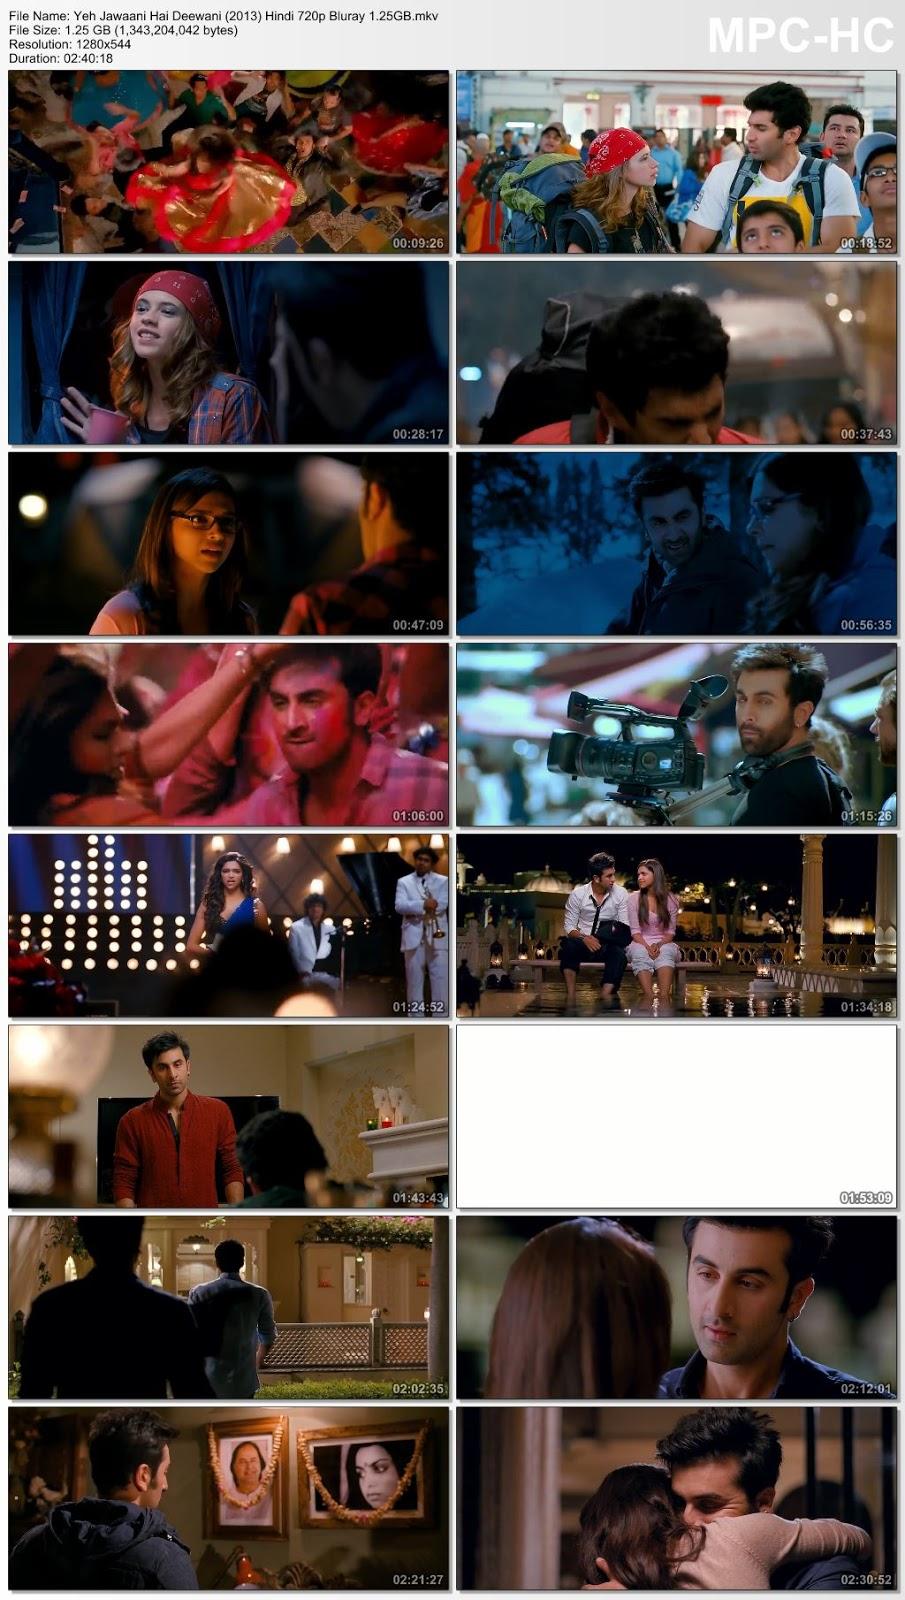 Yeh Jawaani Hai Deewani (2013) 720p Bluray ESubs 1.25GB Desirehub